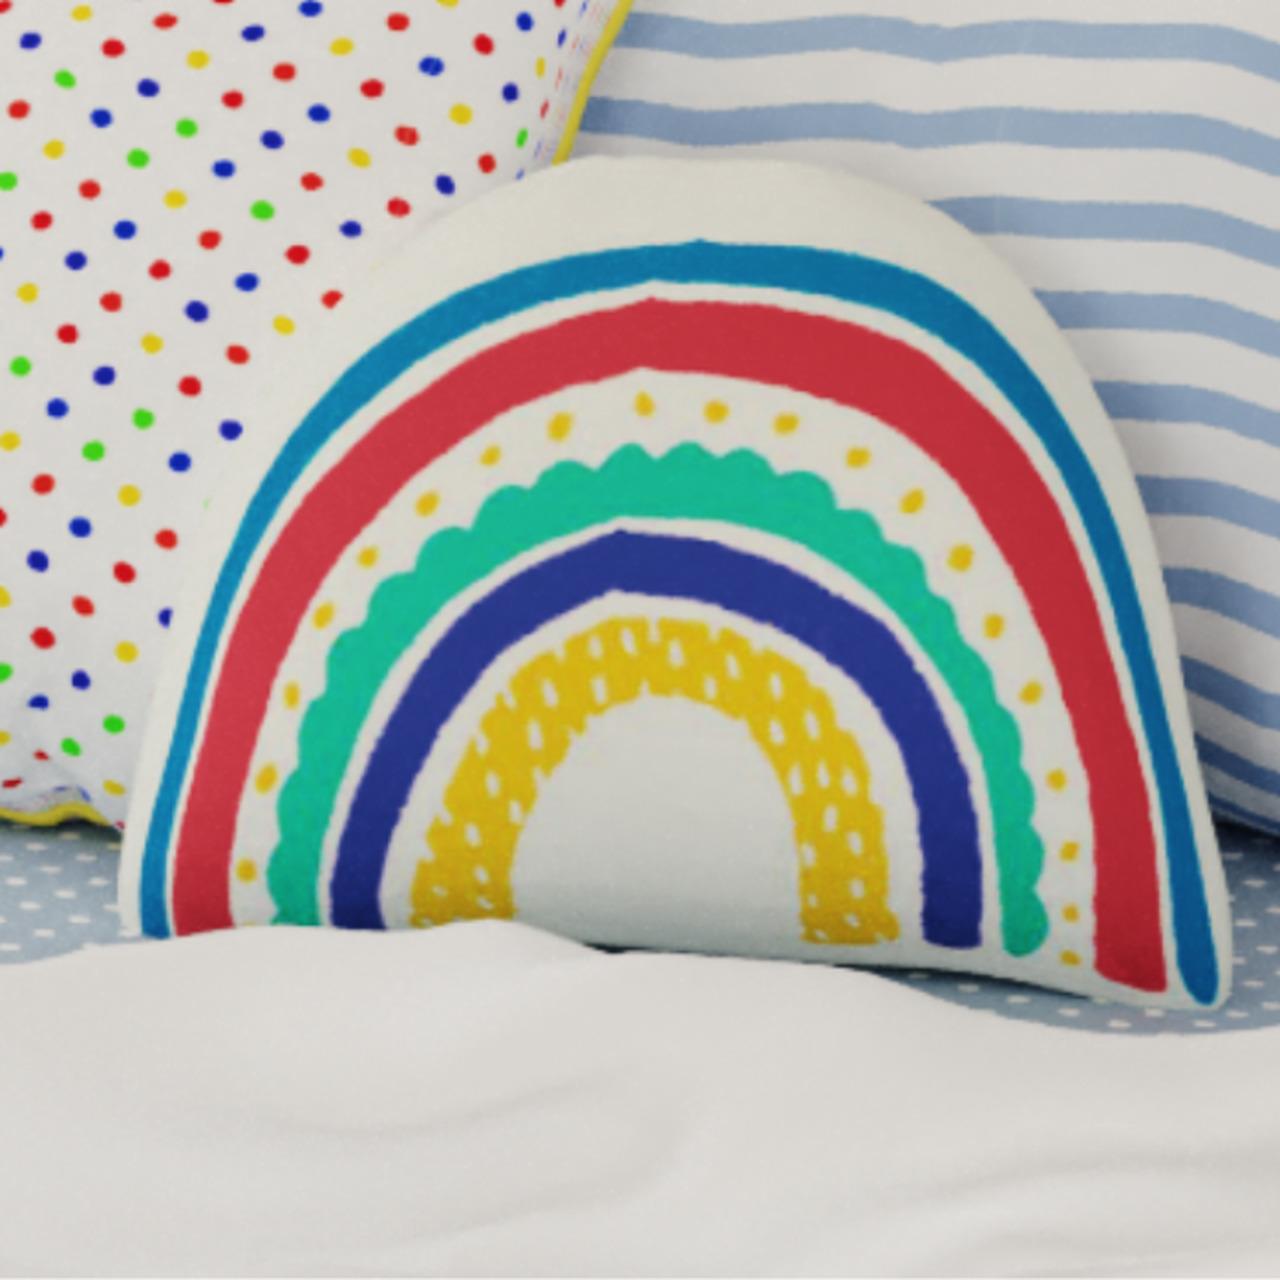 Almofada infantil toy arco íris color